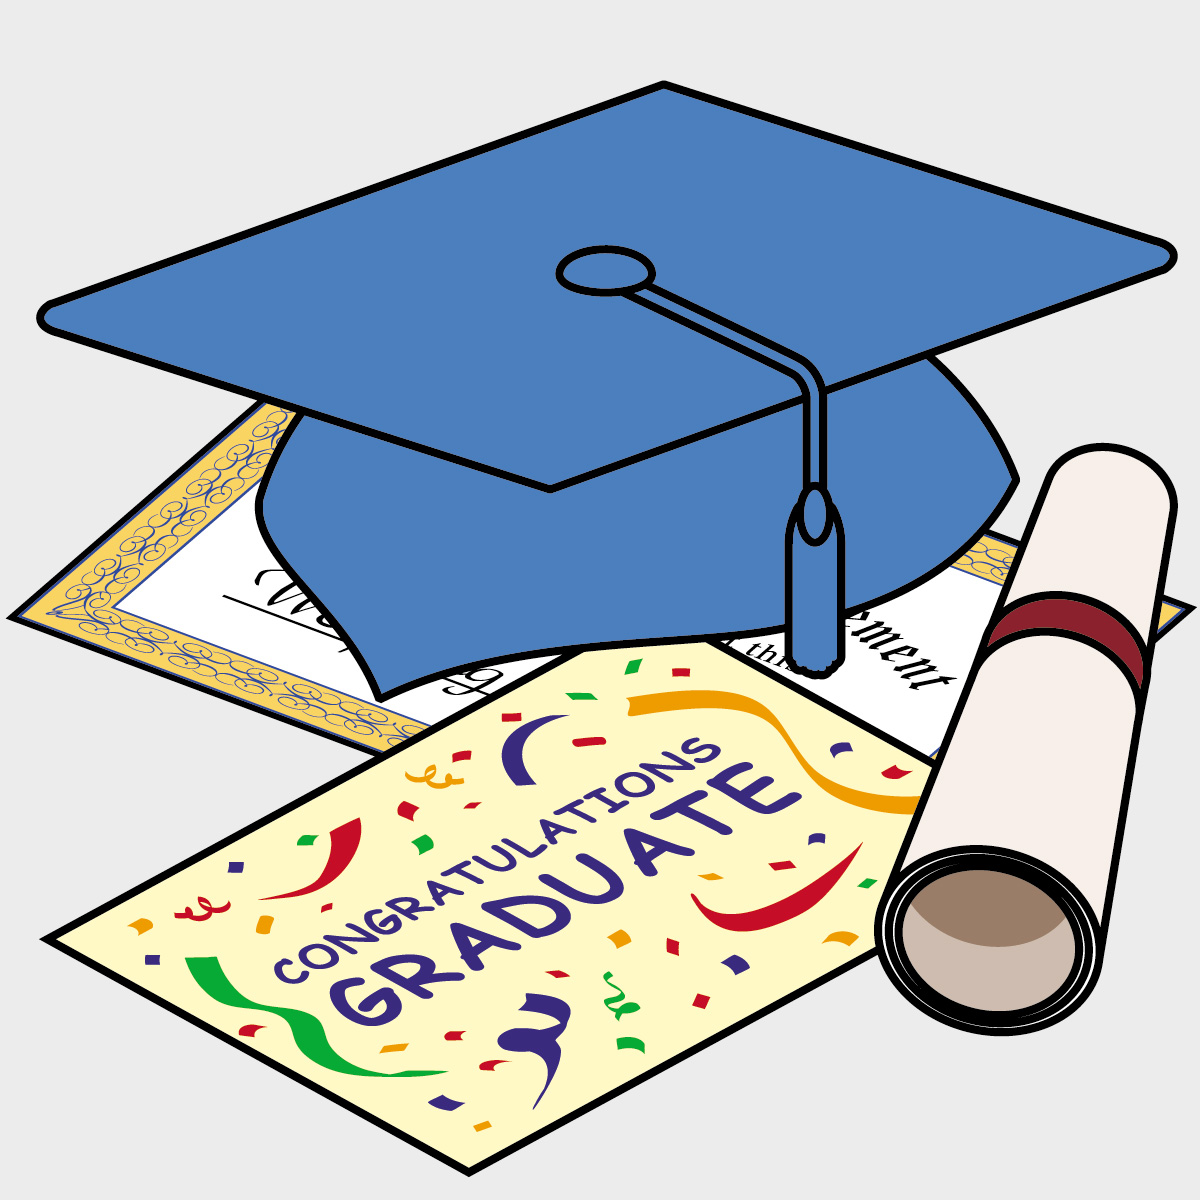 Free Graduation Art, Download Free Clip Art, Free Clip Art.